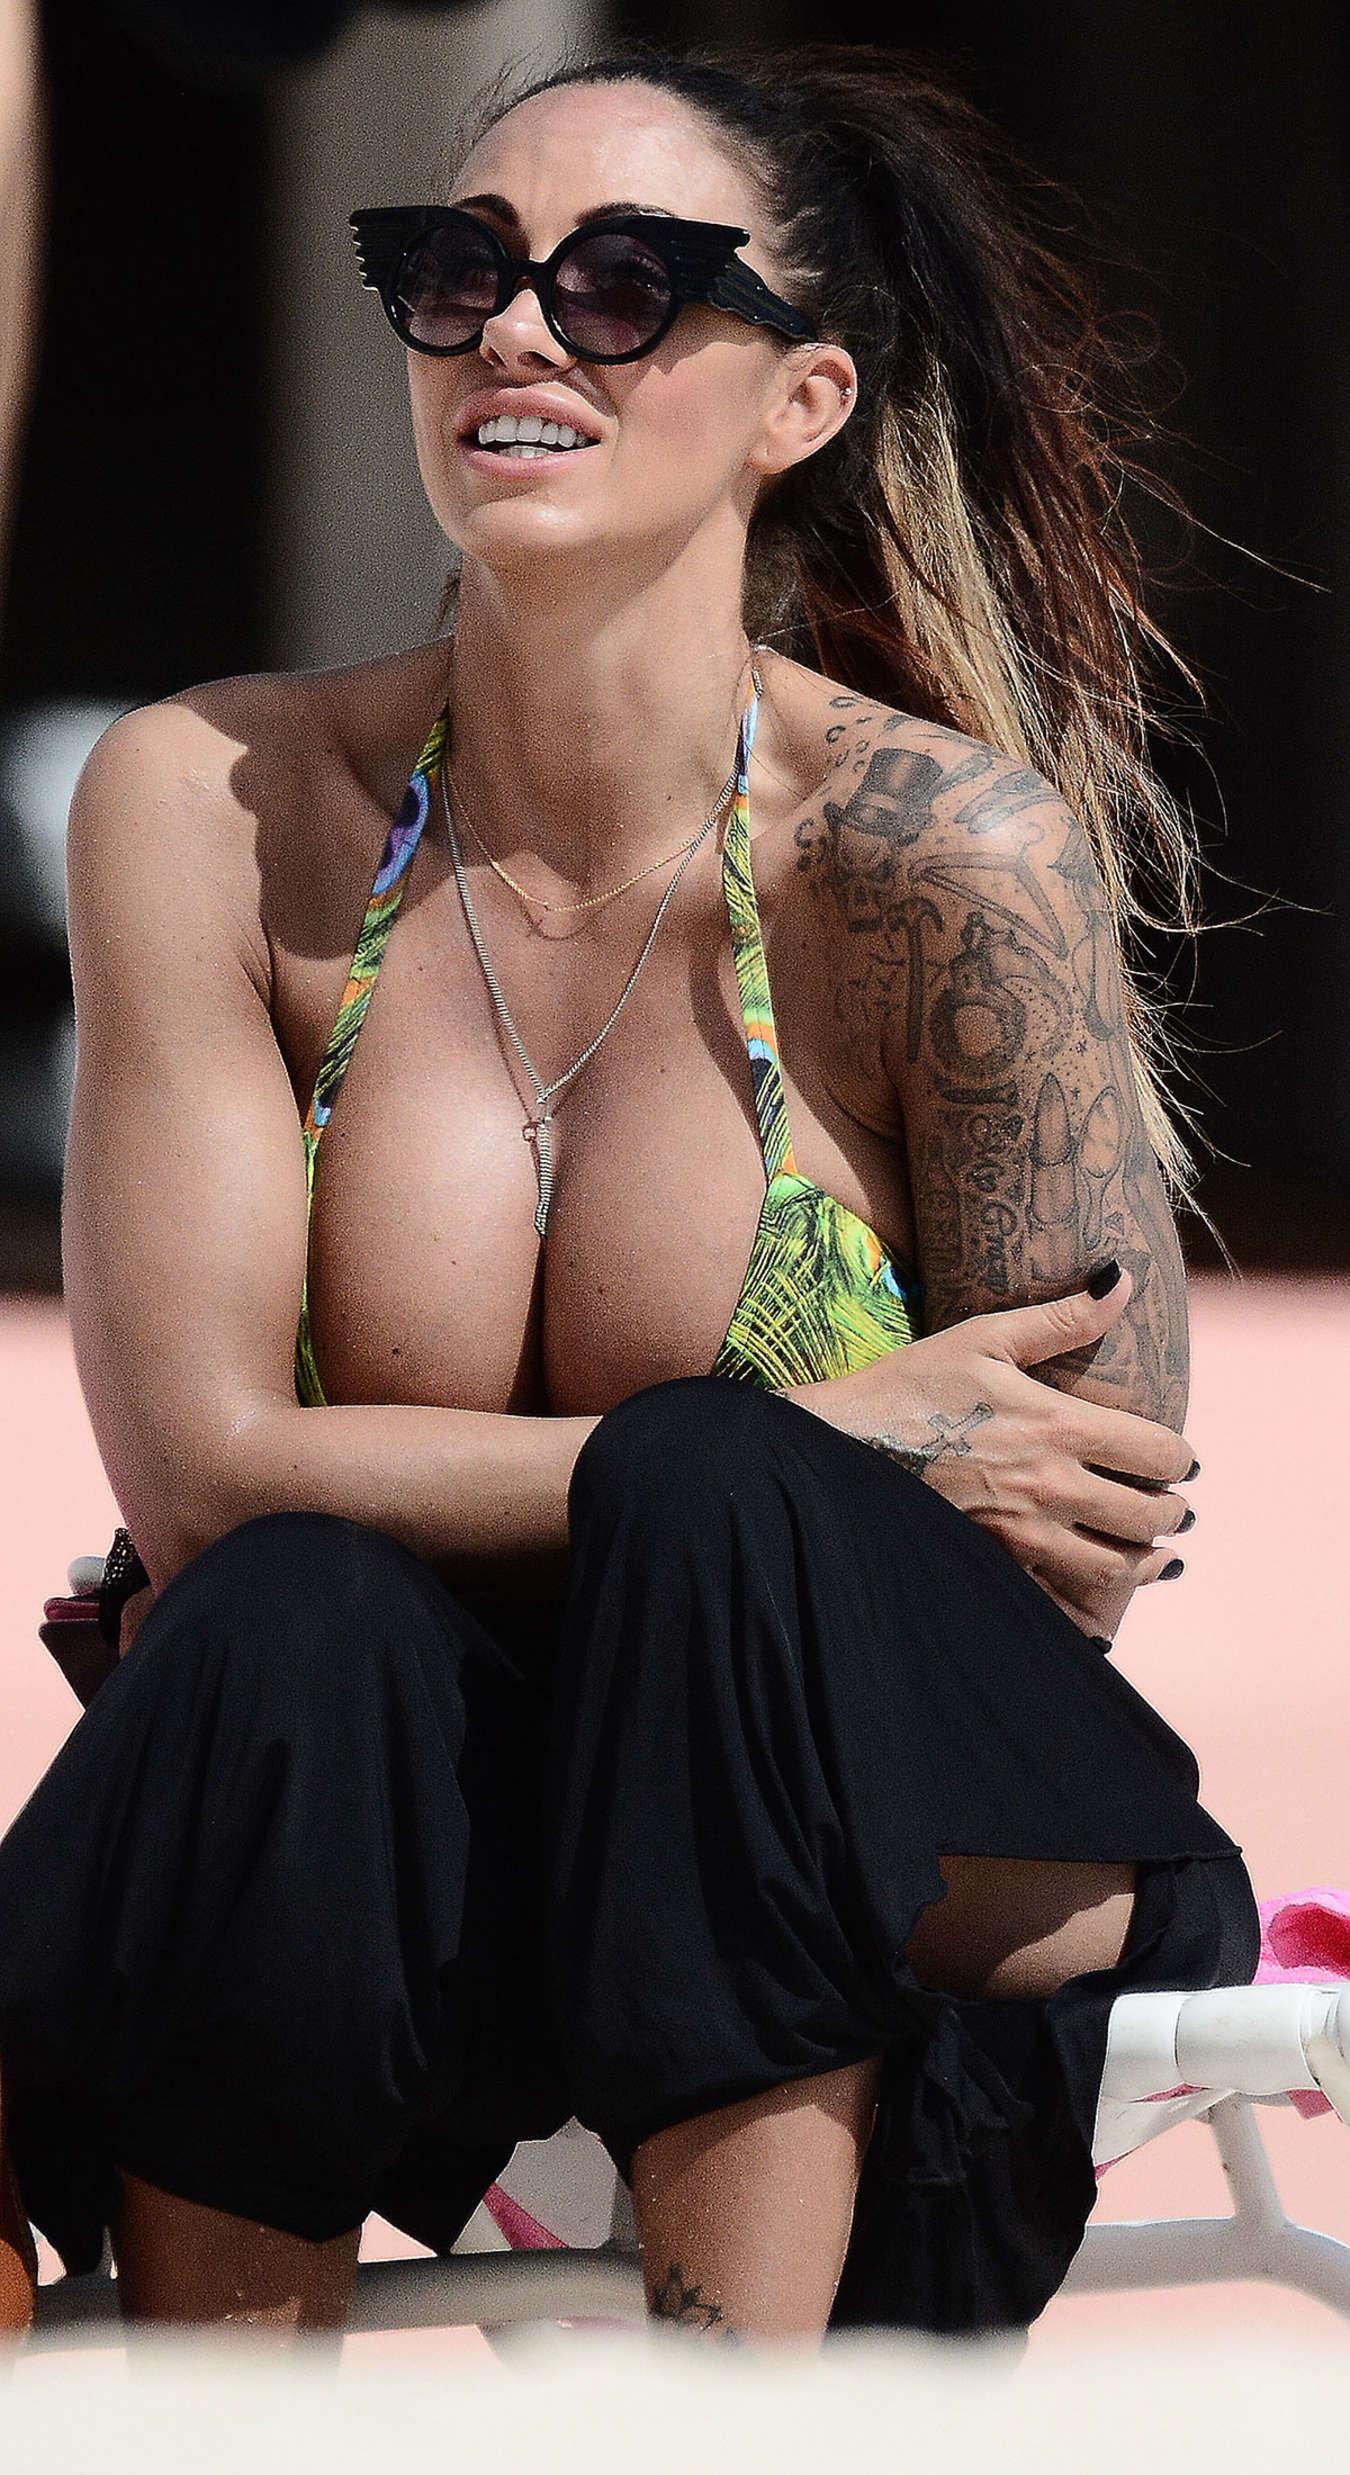 Jodie Marsh 2015 : Jodie Marsh in Bikini -07